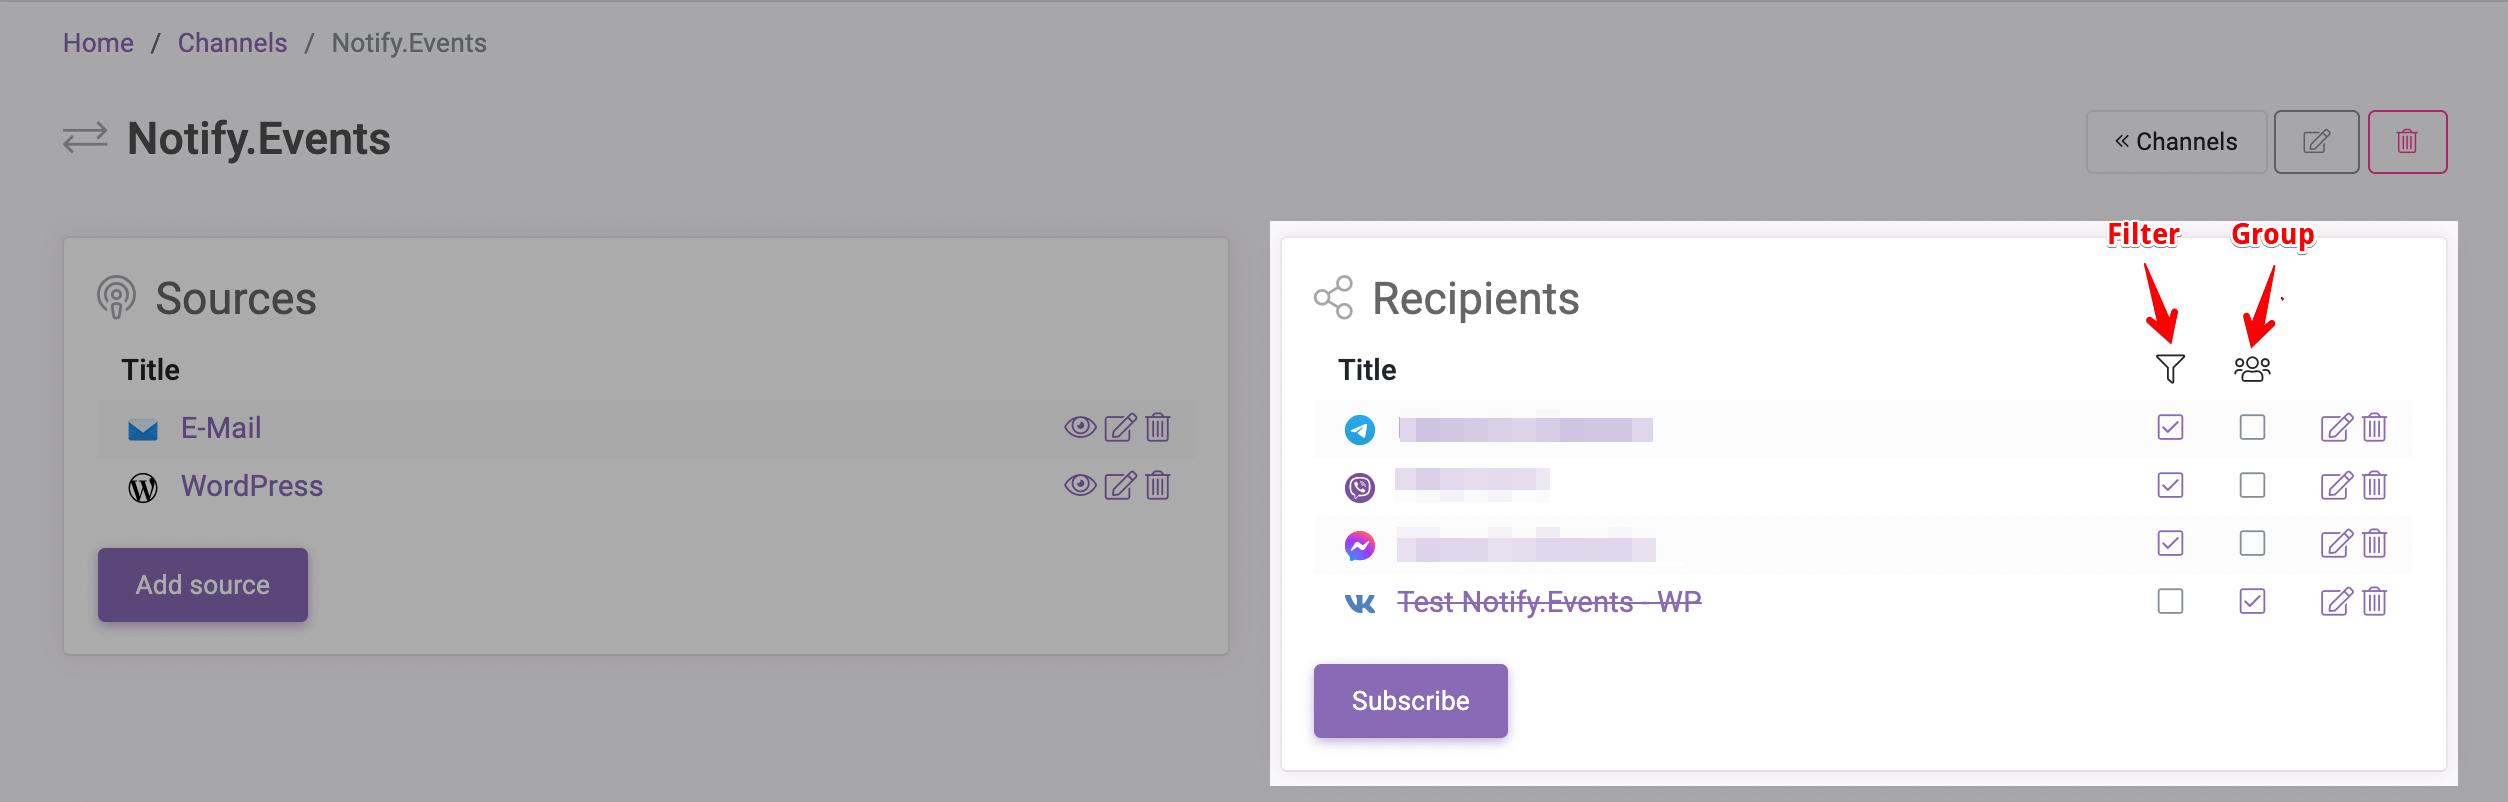 Notify.Events Recipients